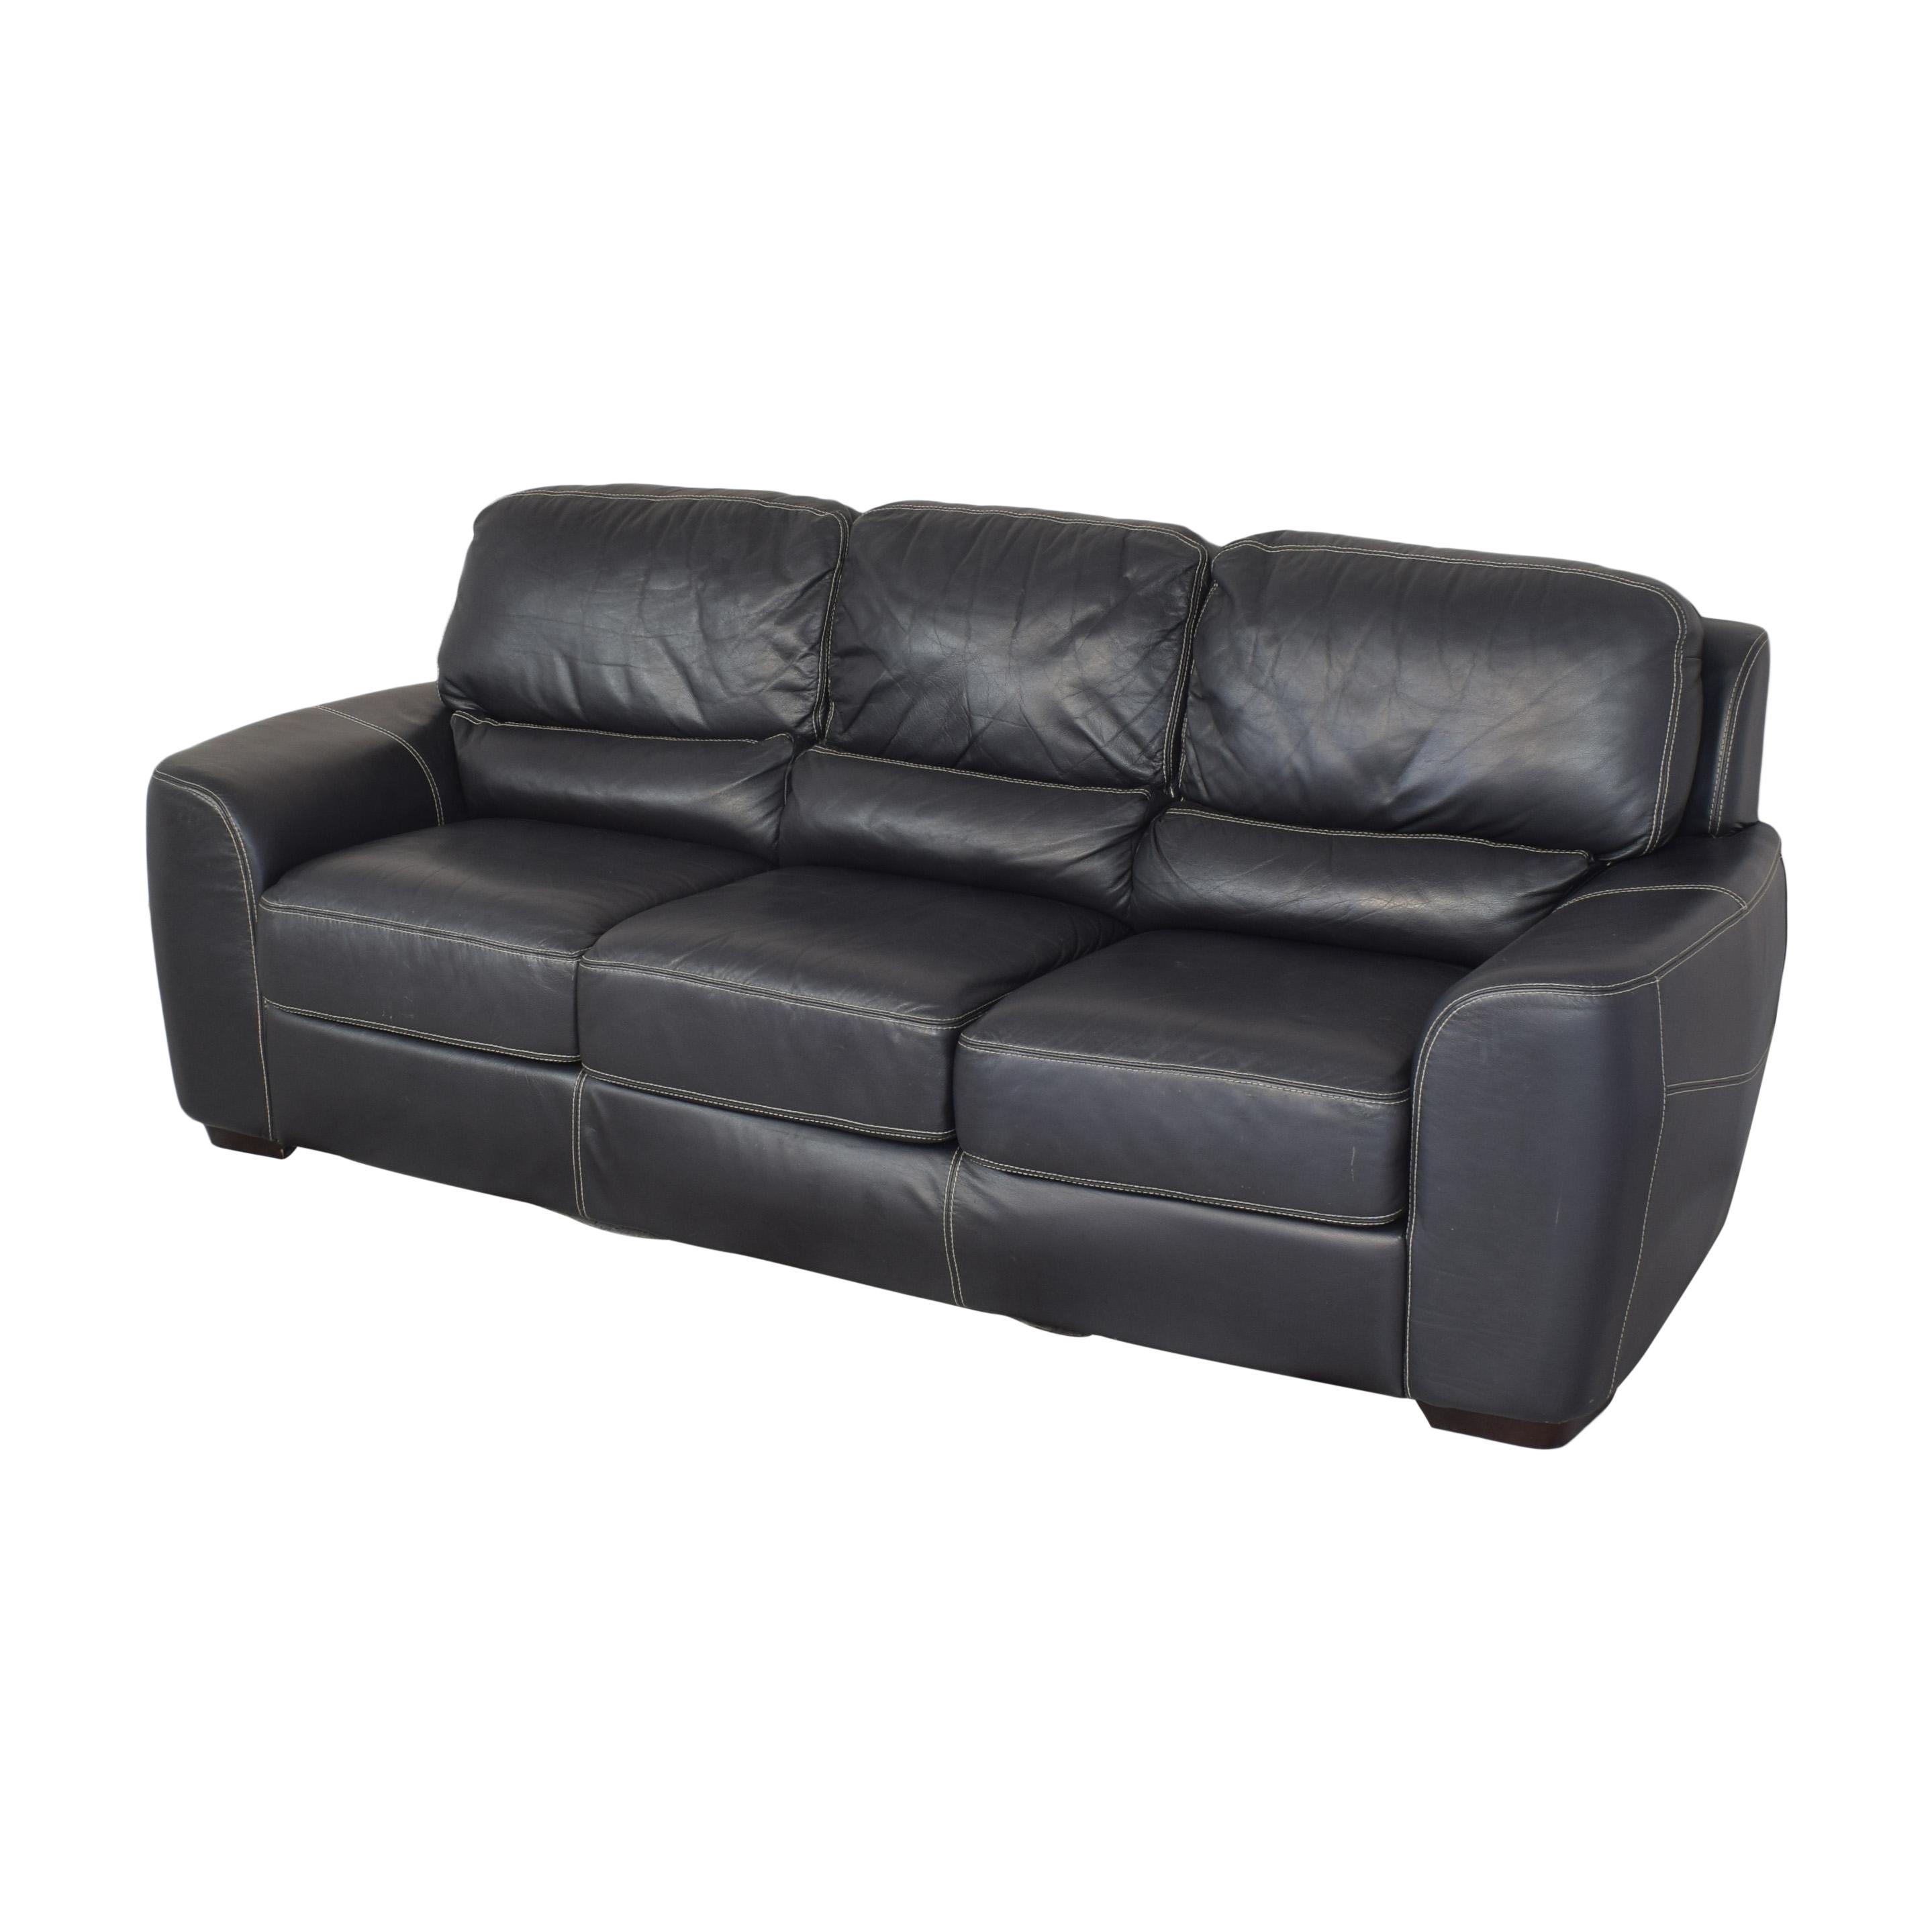 Z Gallerie Z Gallerie Three-Cushion Sofa nyc